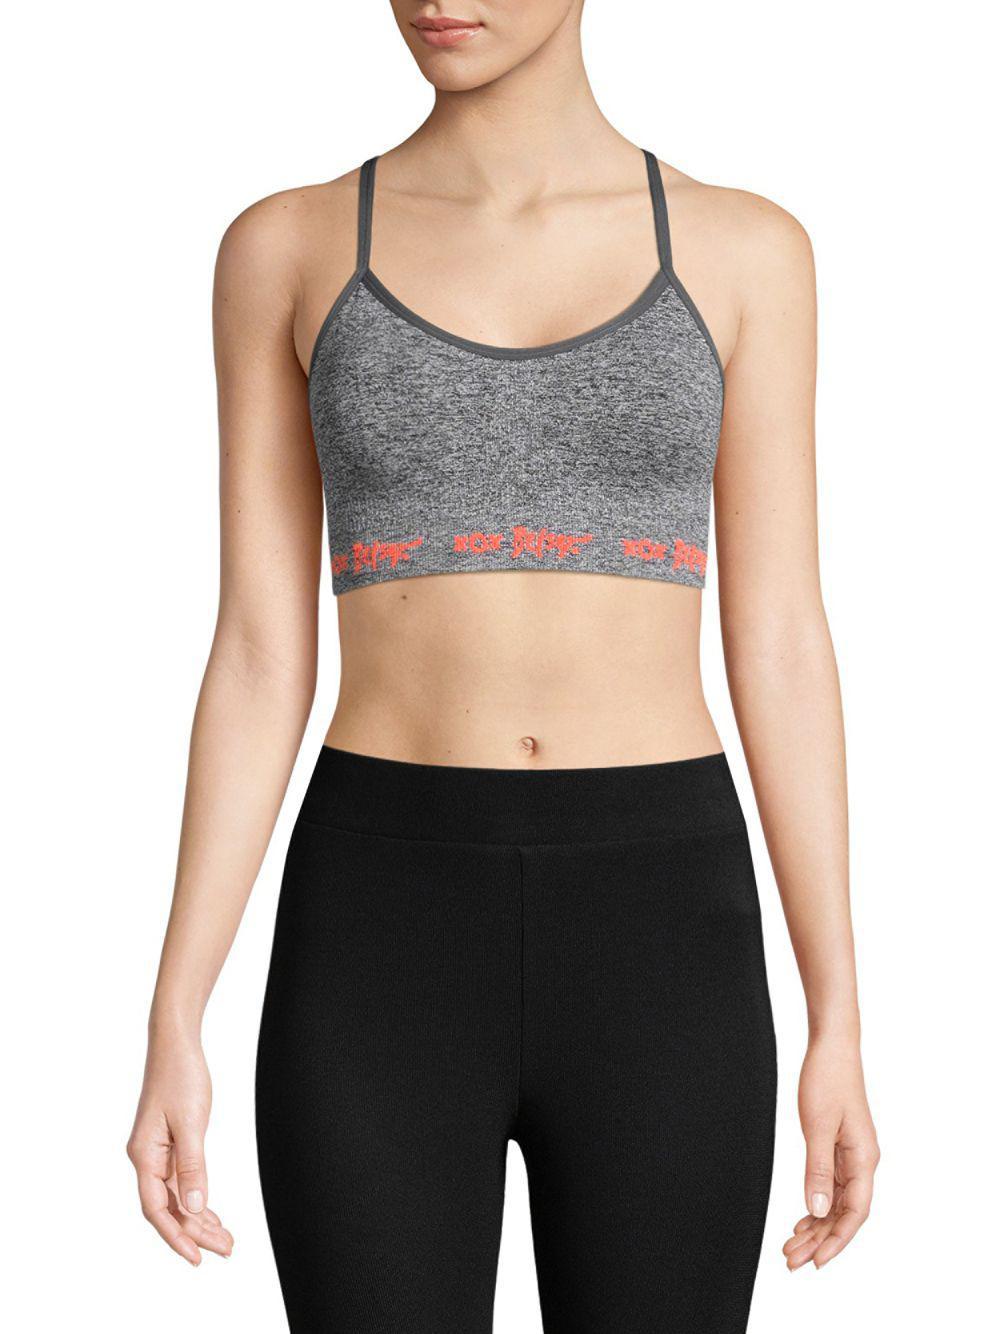 5bb7ea9f8312a Lyst - Betsey Johnson Knit Sports Bra in Gray